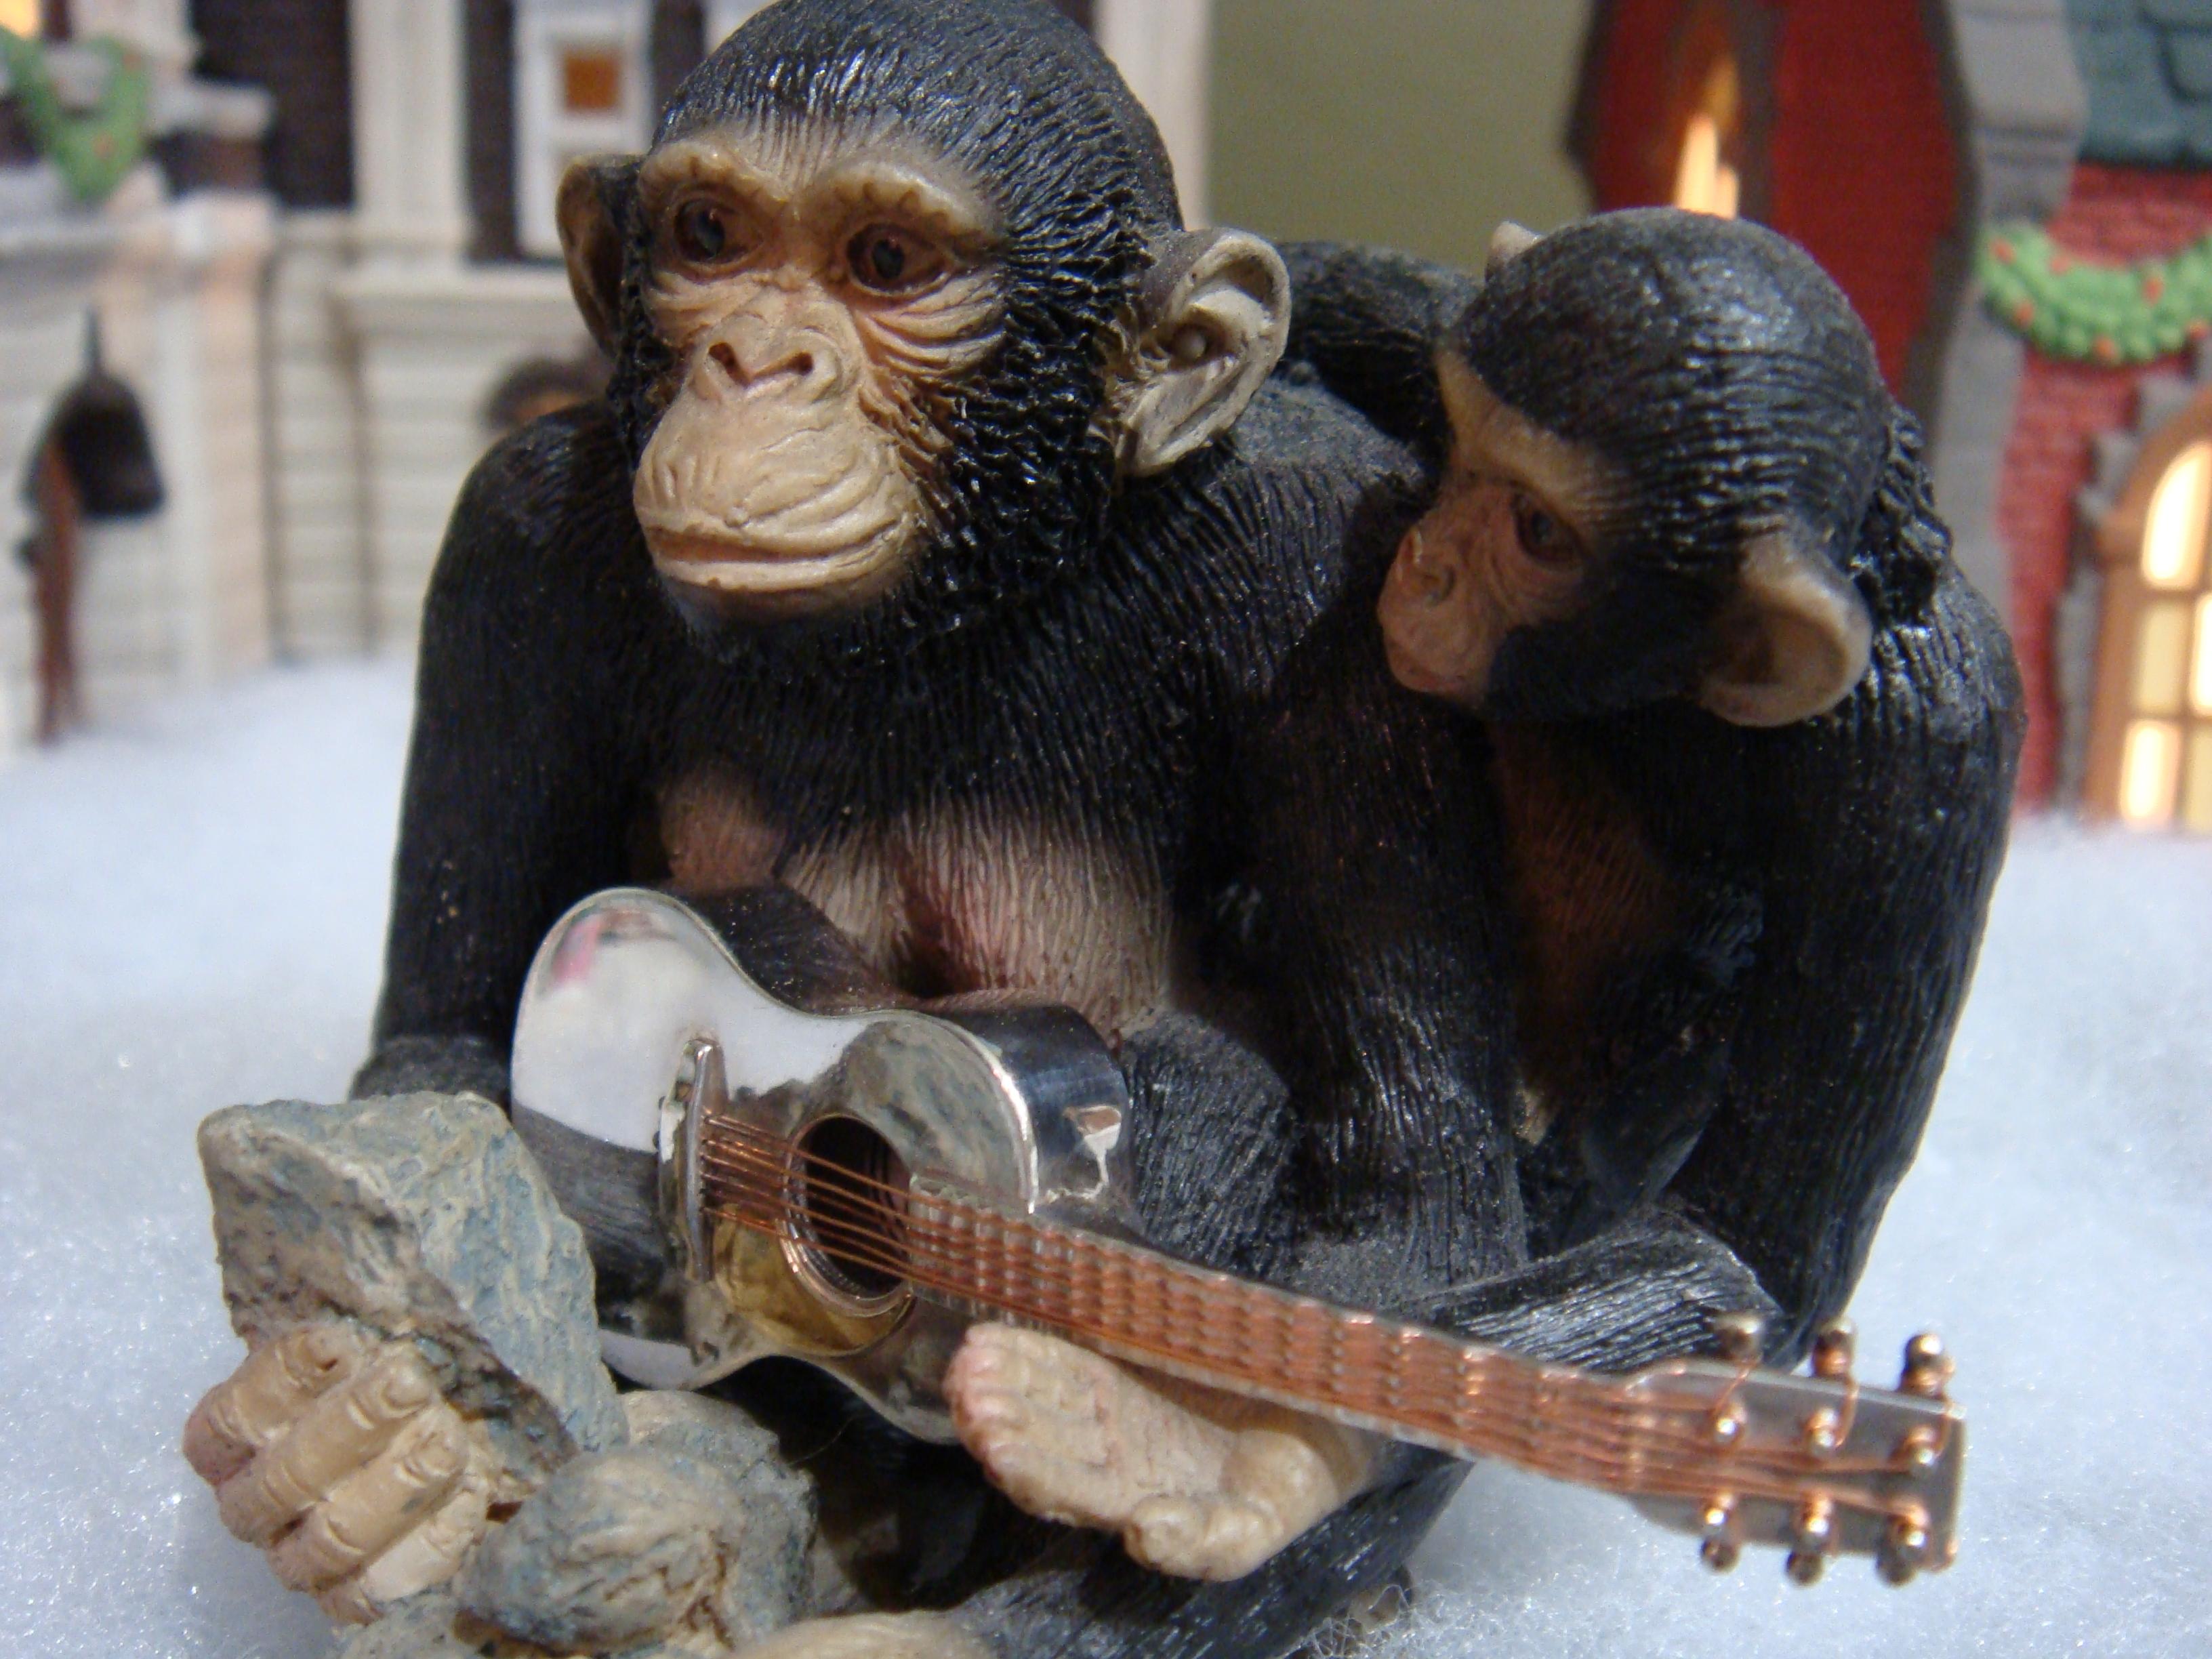 Little monkeys love to play 'em